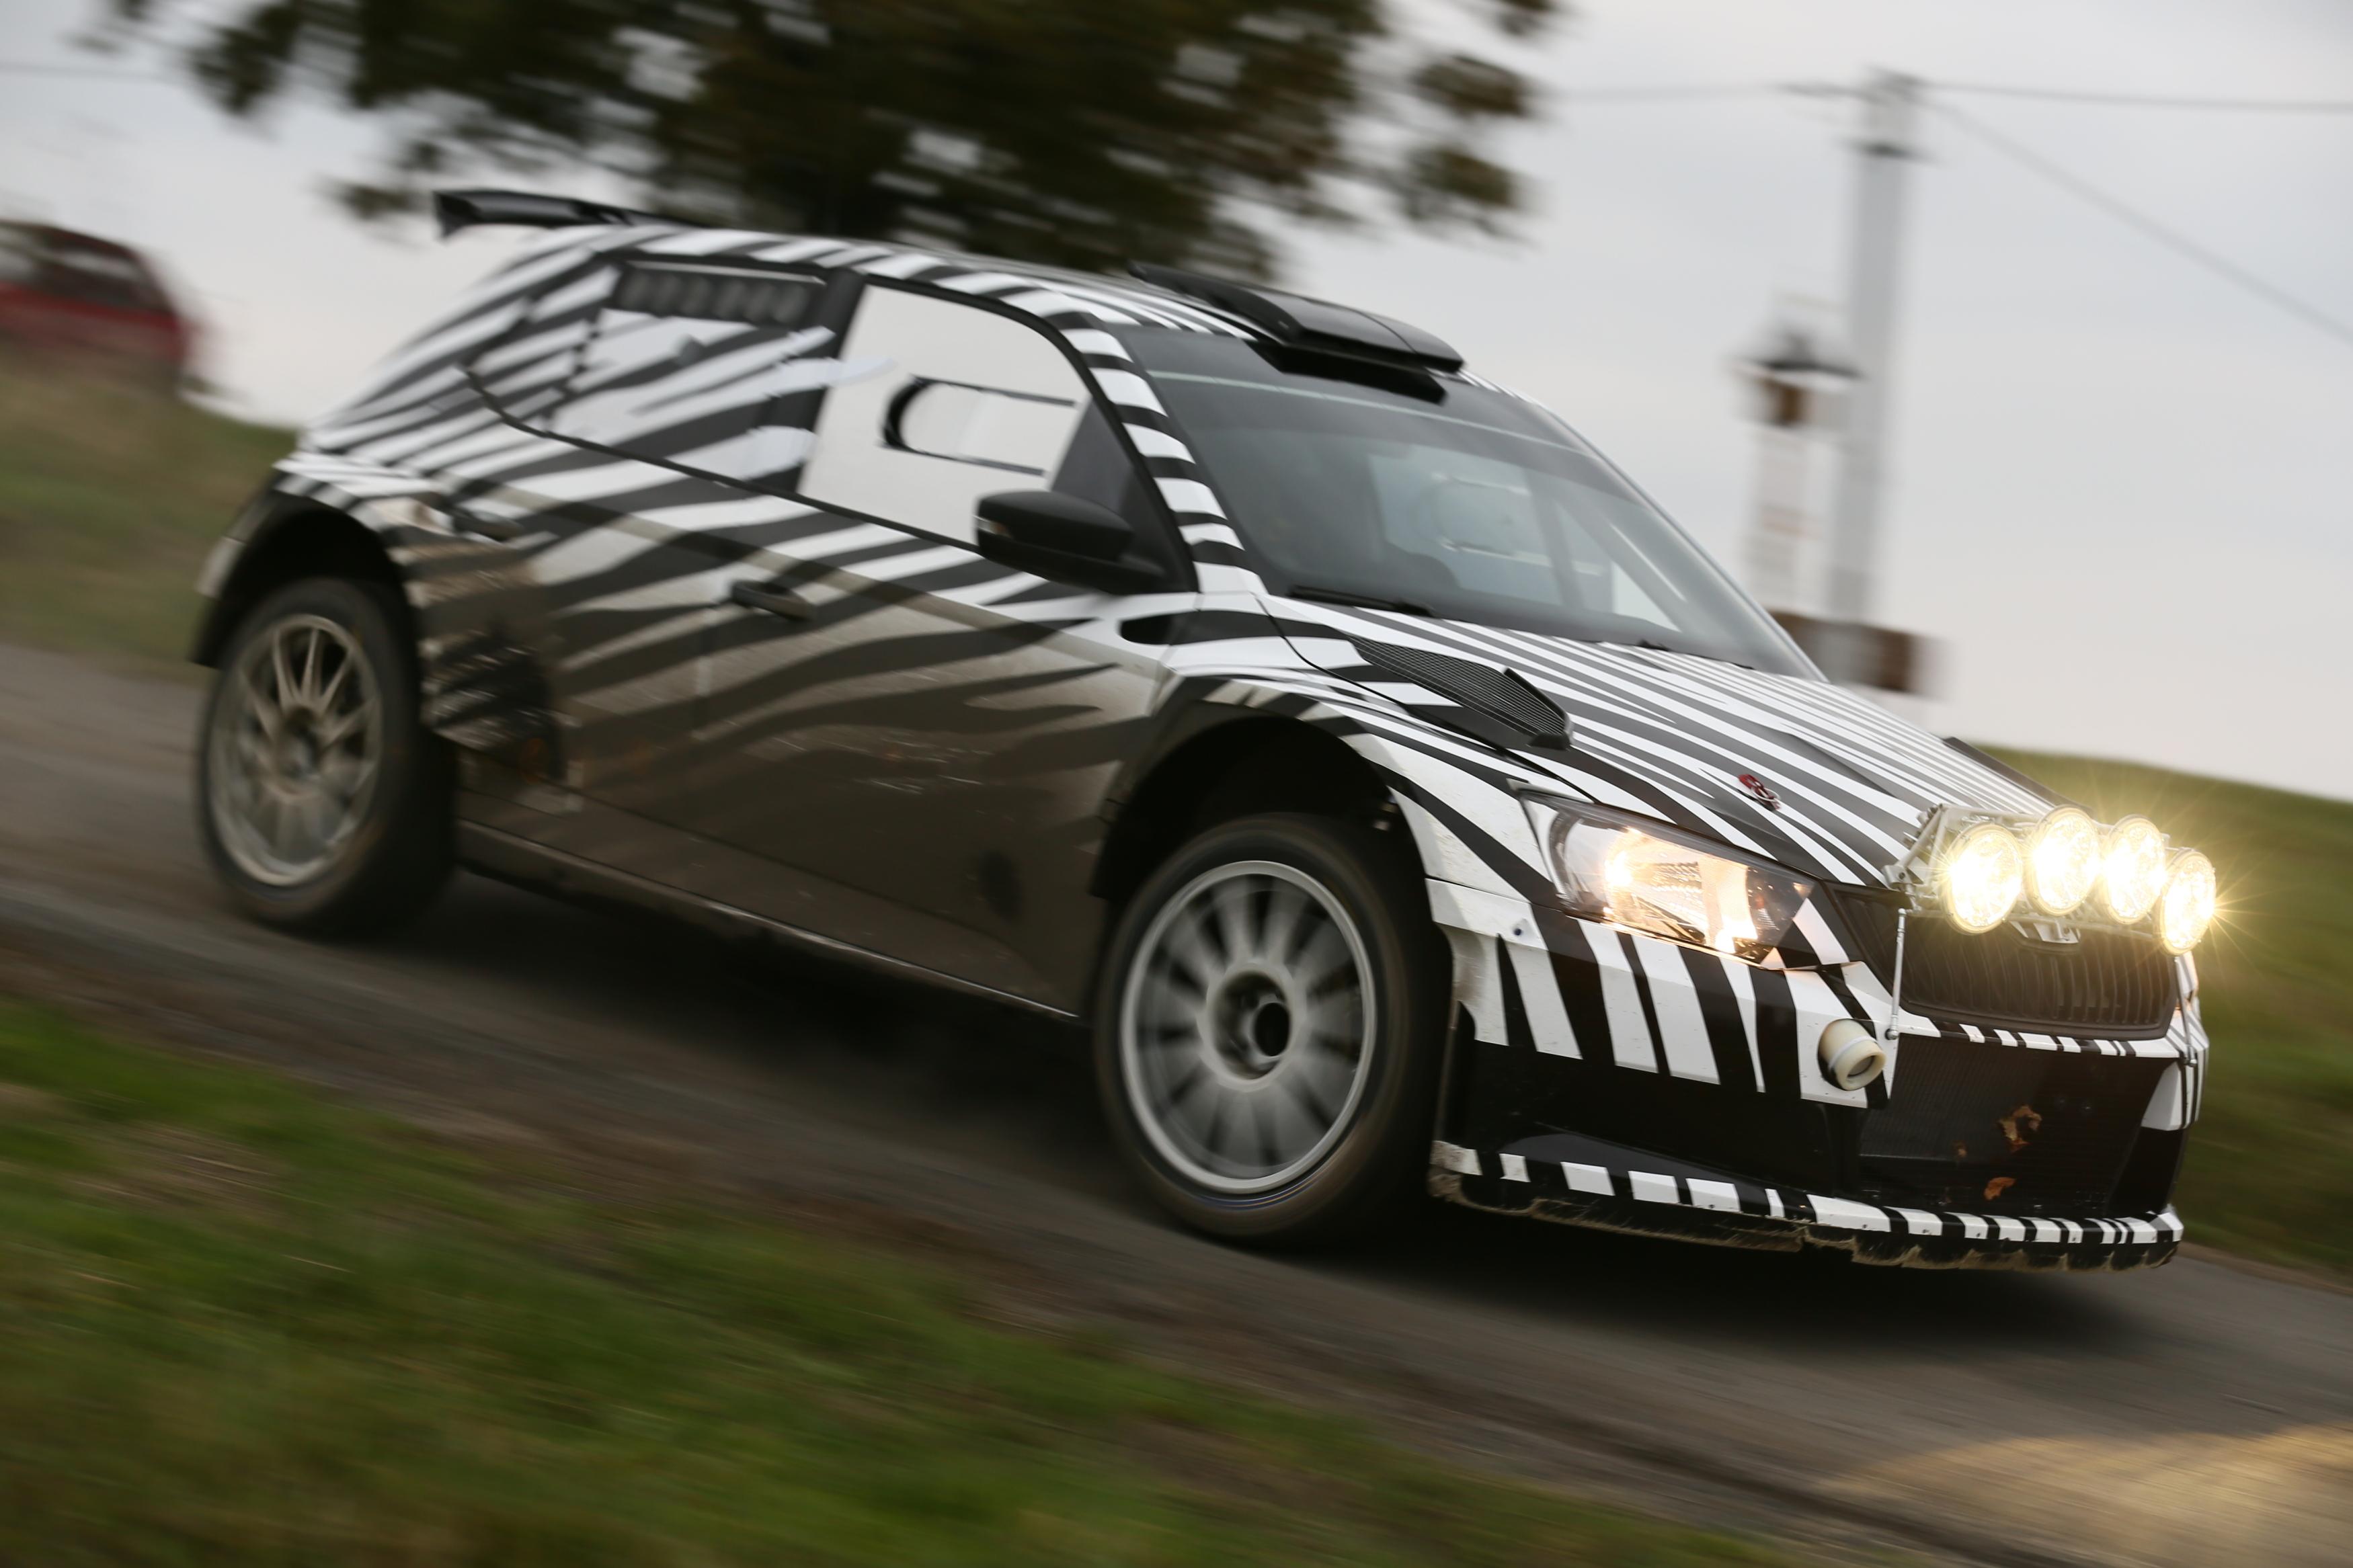 koda fabia r 5 development of the new rally car on schedule koda storyboard. Black Bedroom Furniture Sets. Home Design Ideas